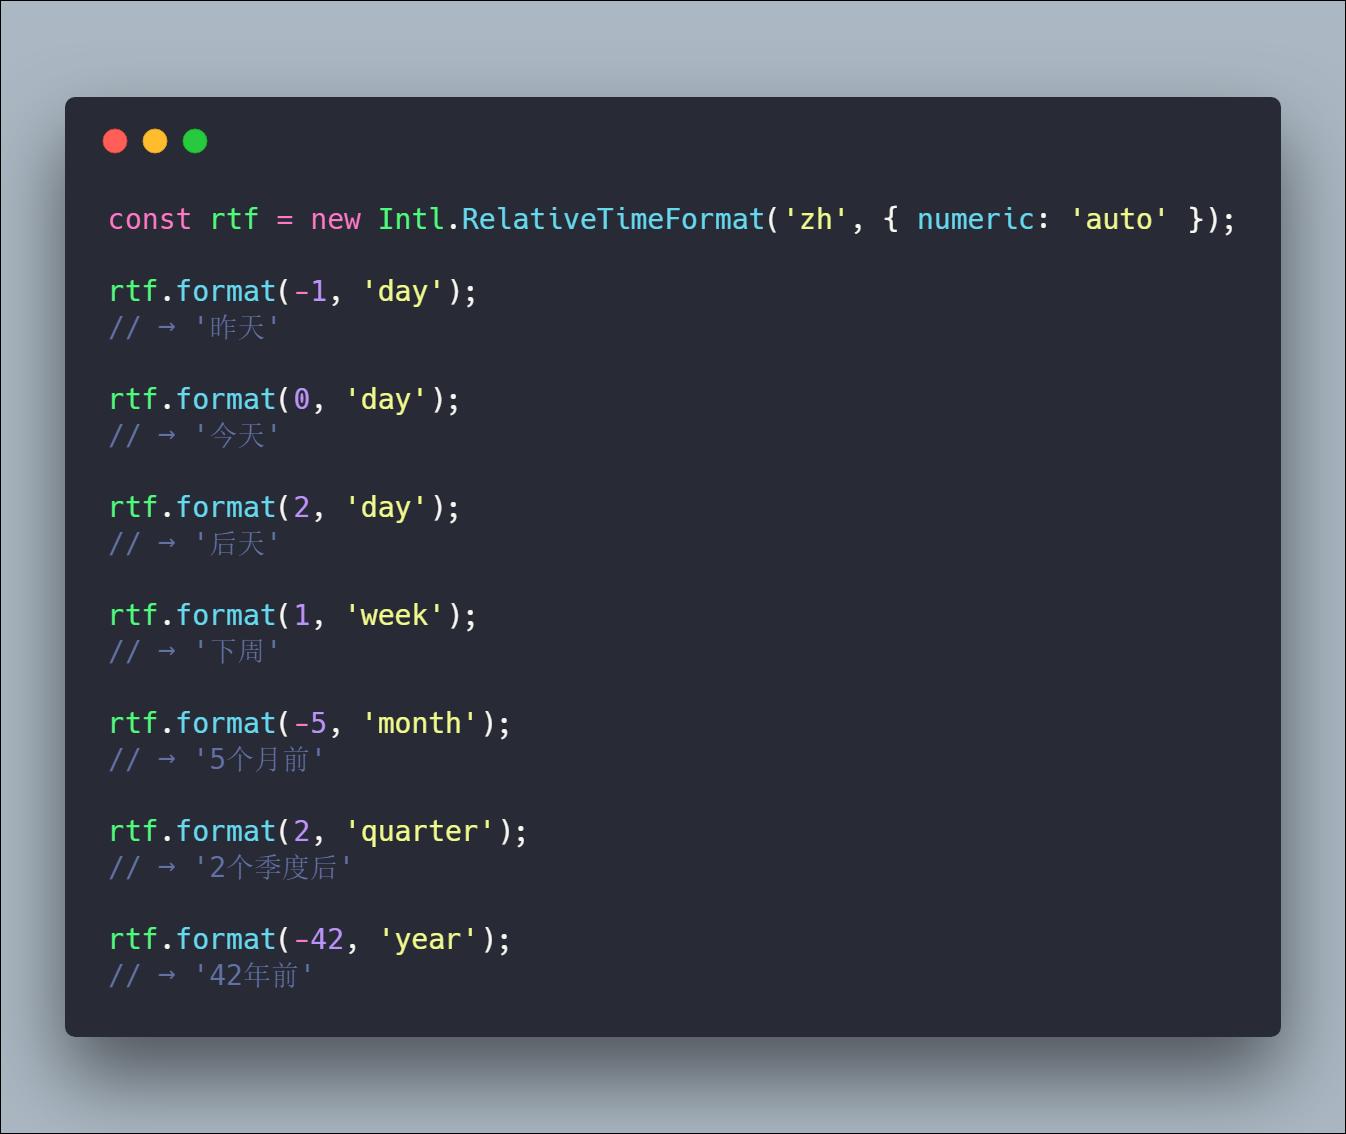 国际化相对时间格式化API:Intl.RelativeTimeFormat